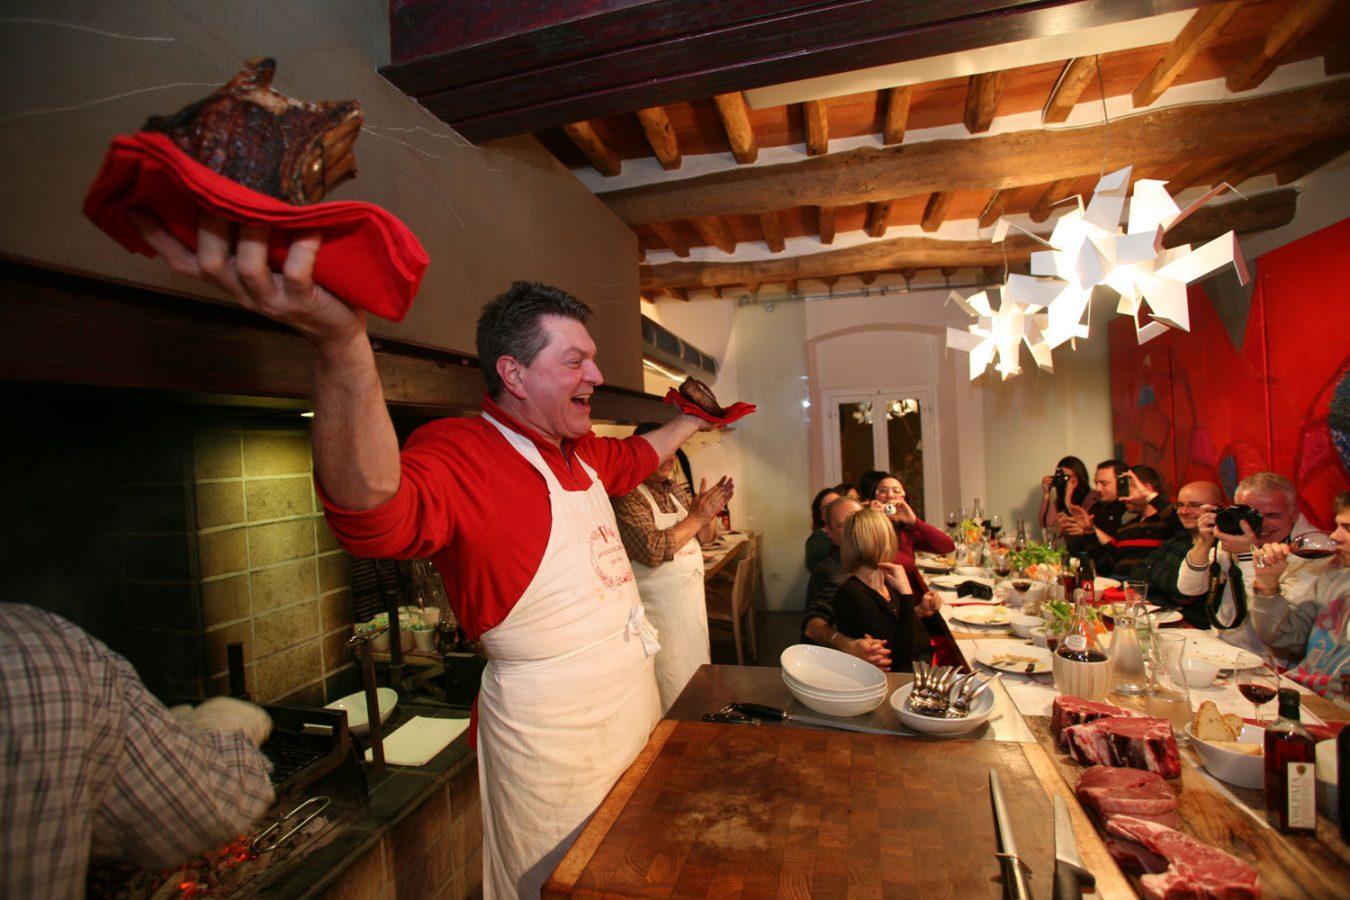 MONTECRISTO Blog: Italian Restaurants in Italy